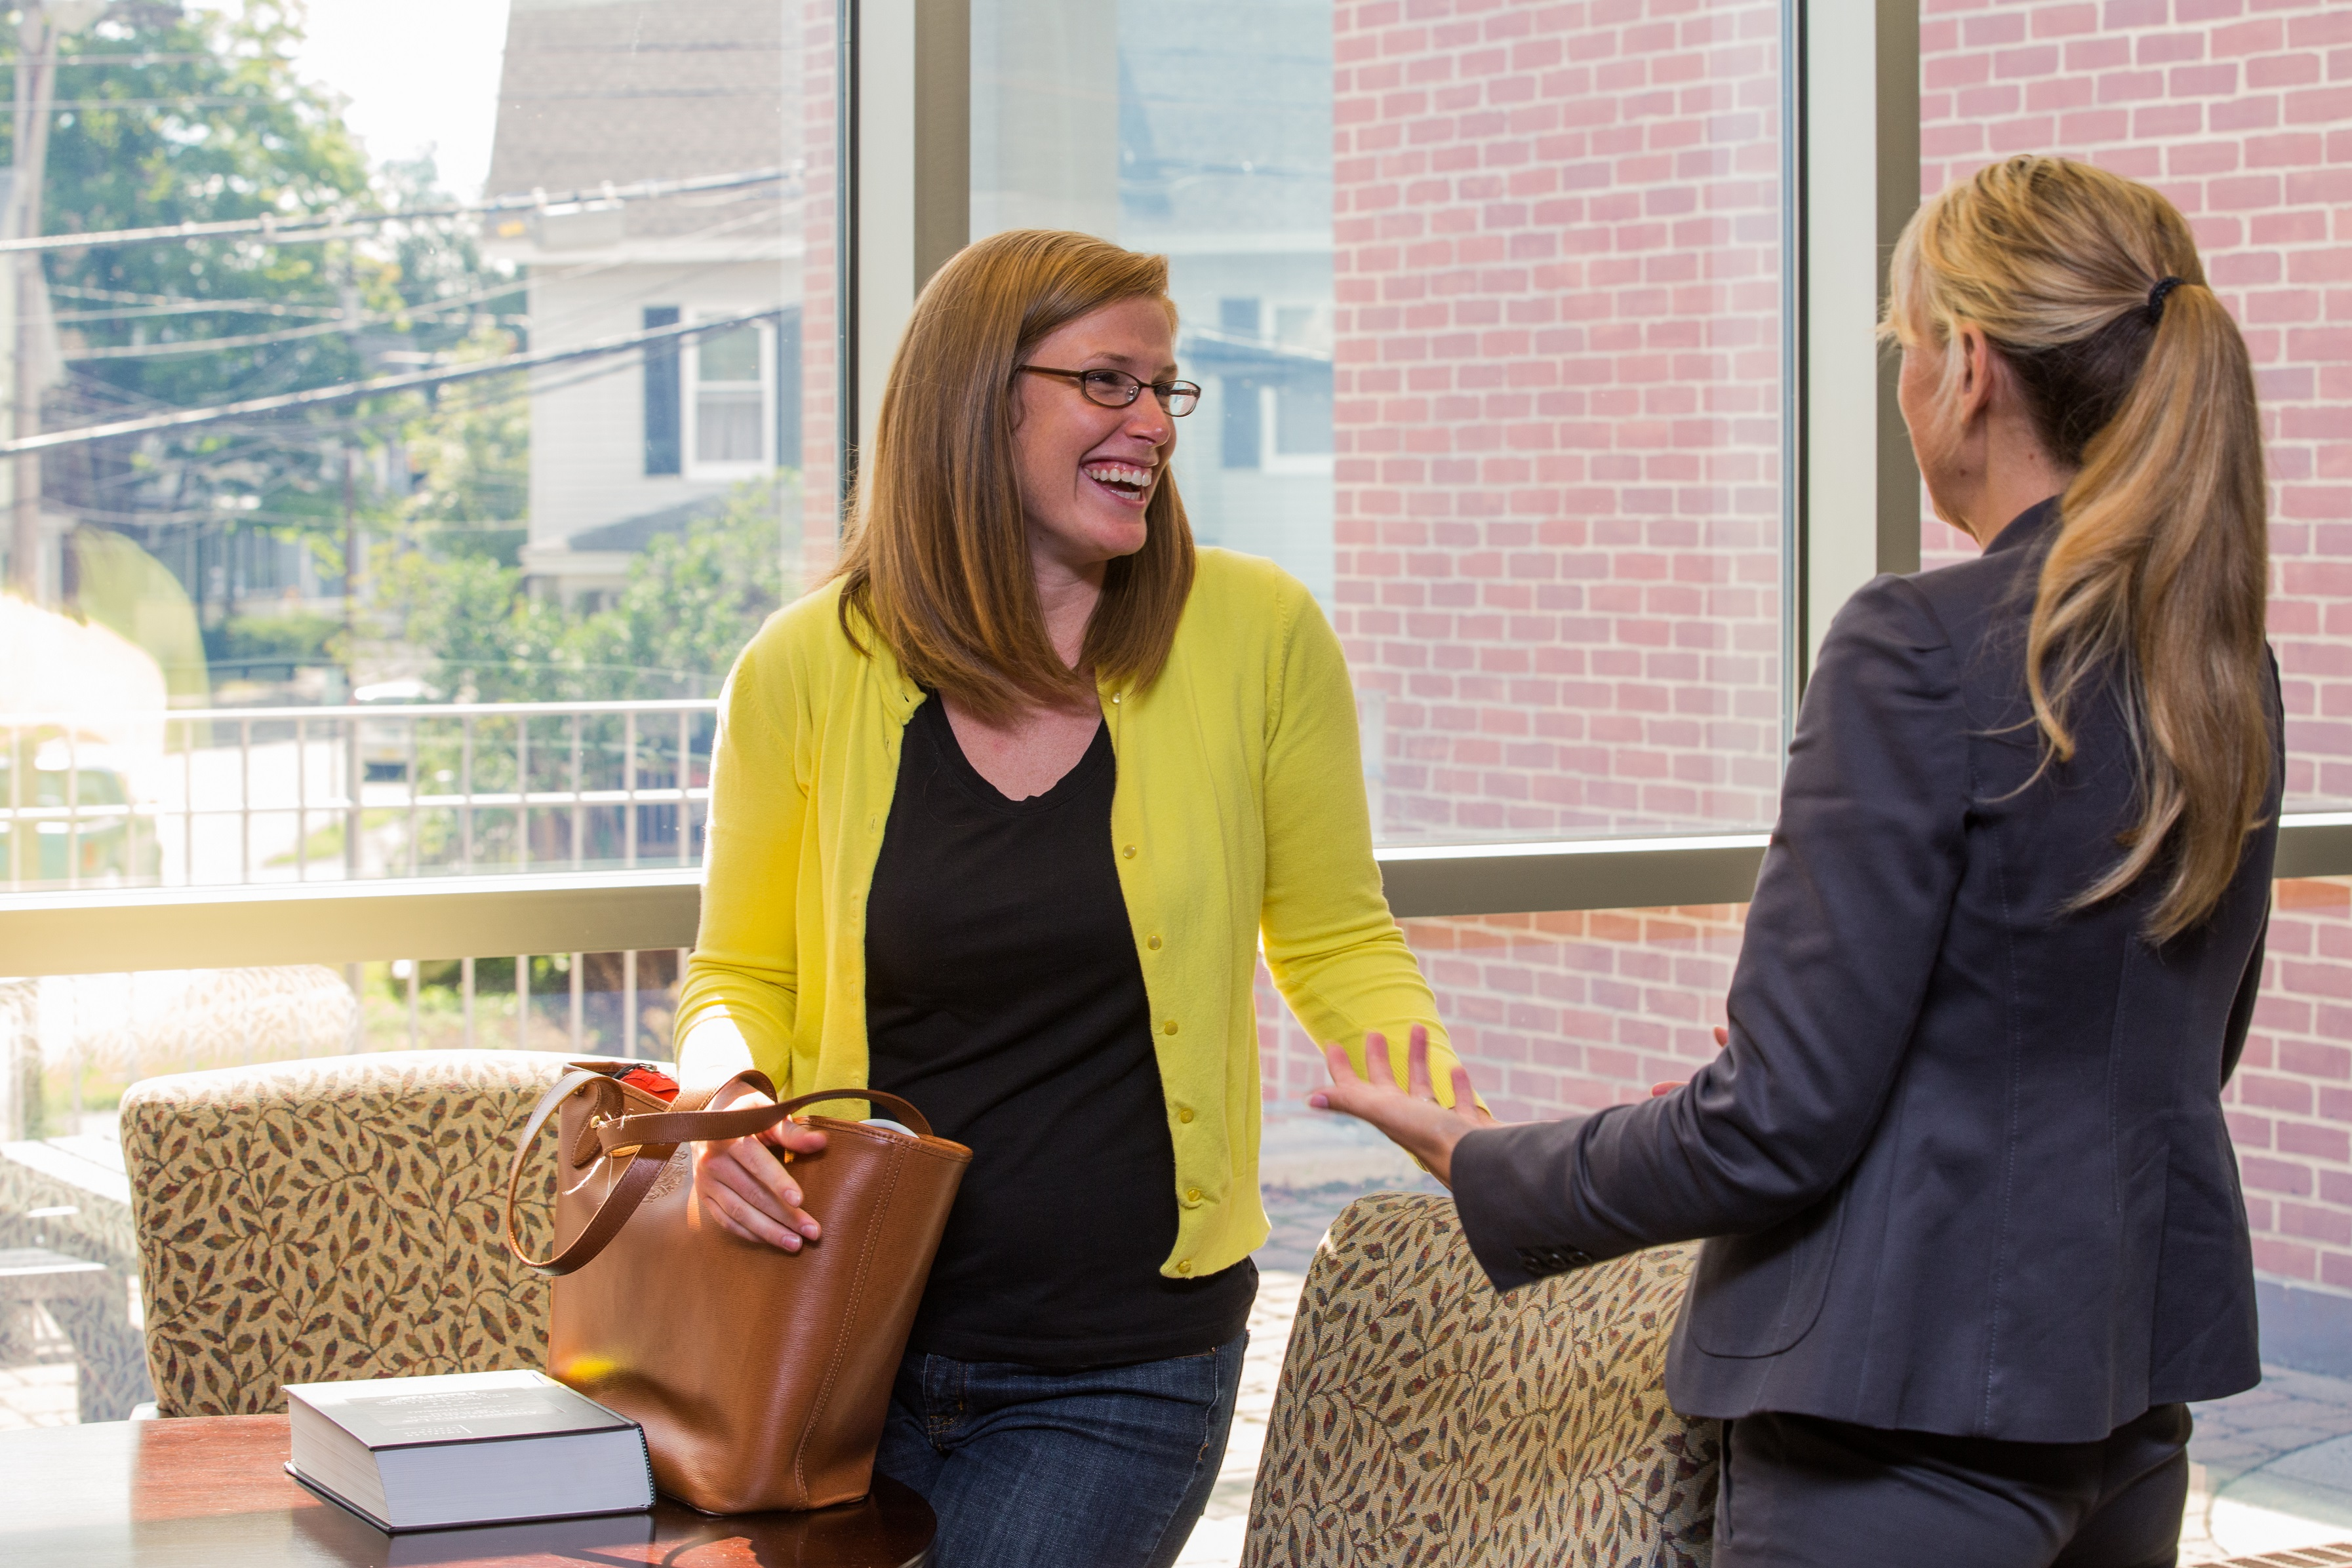 students talking in hallway